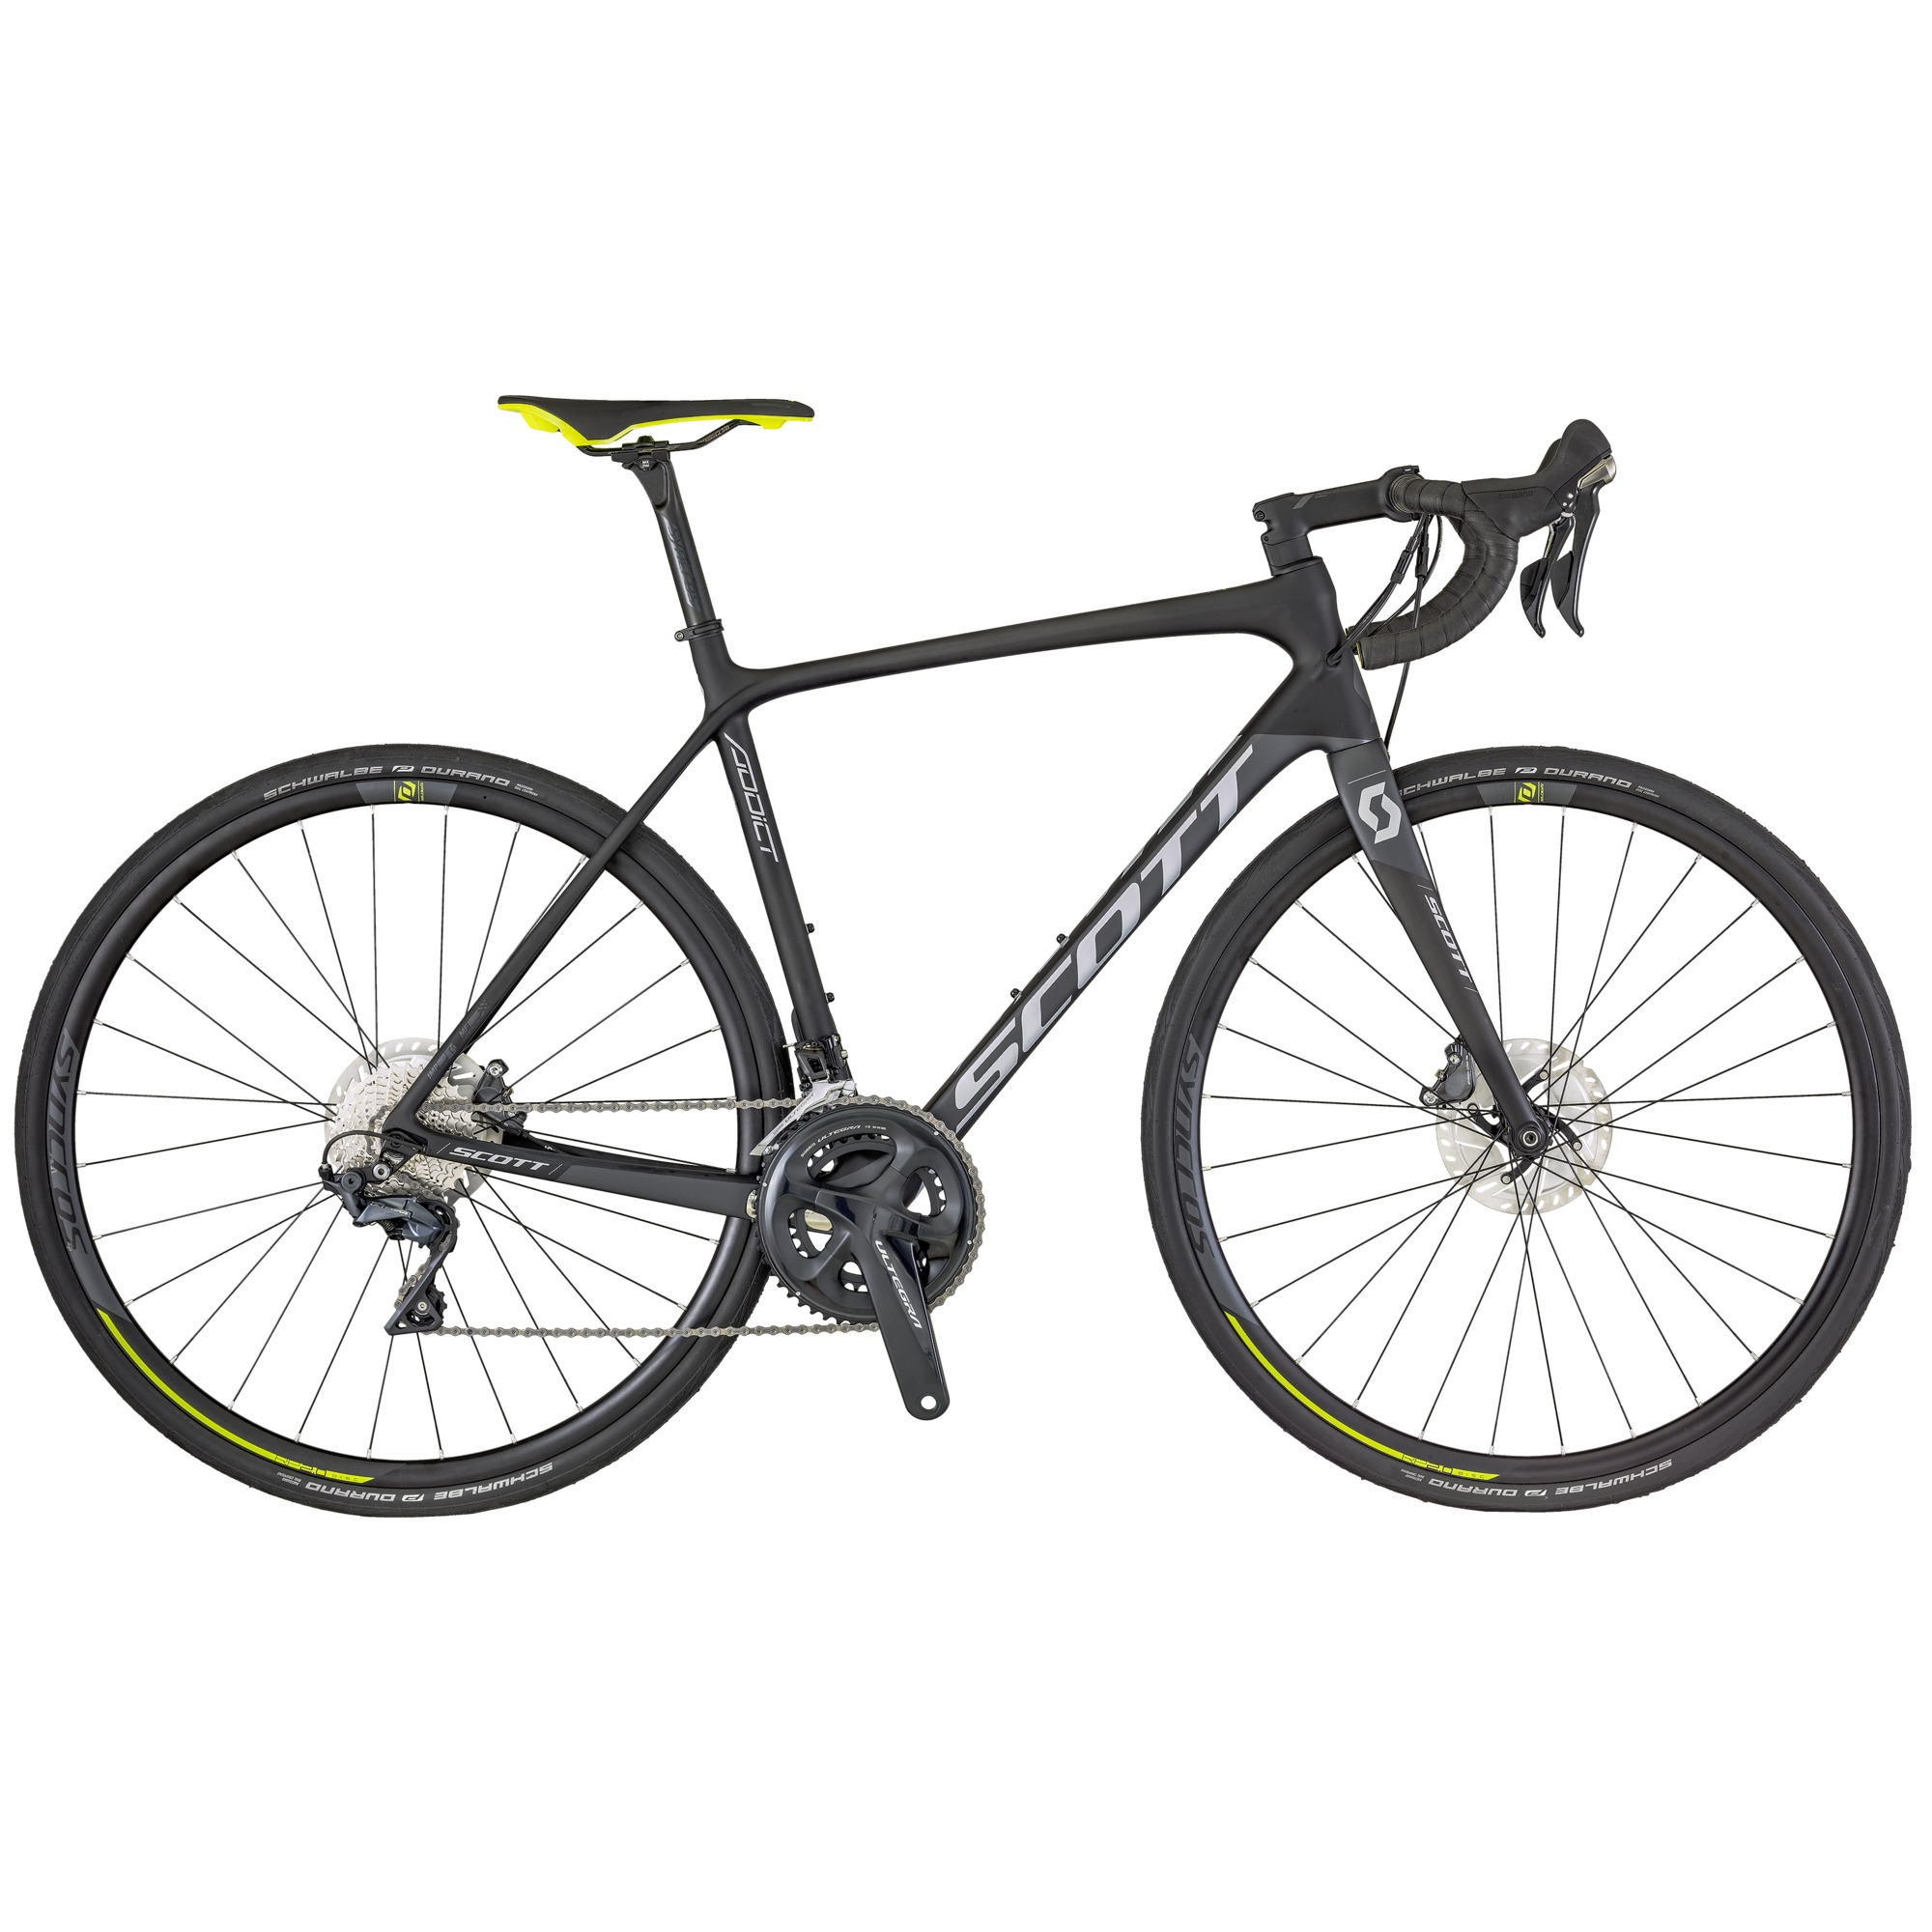 SCOTT Addict 10 Disc Bike S52 - Zweirad Homann